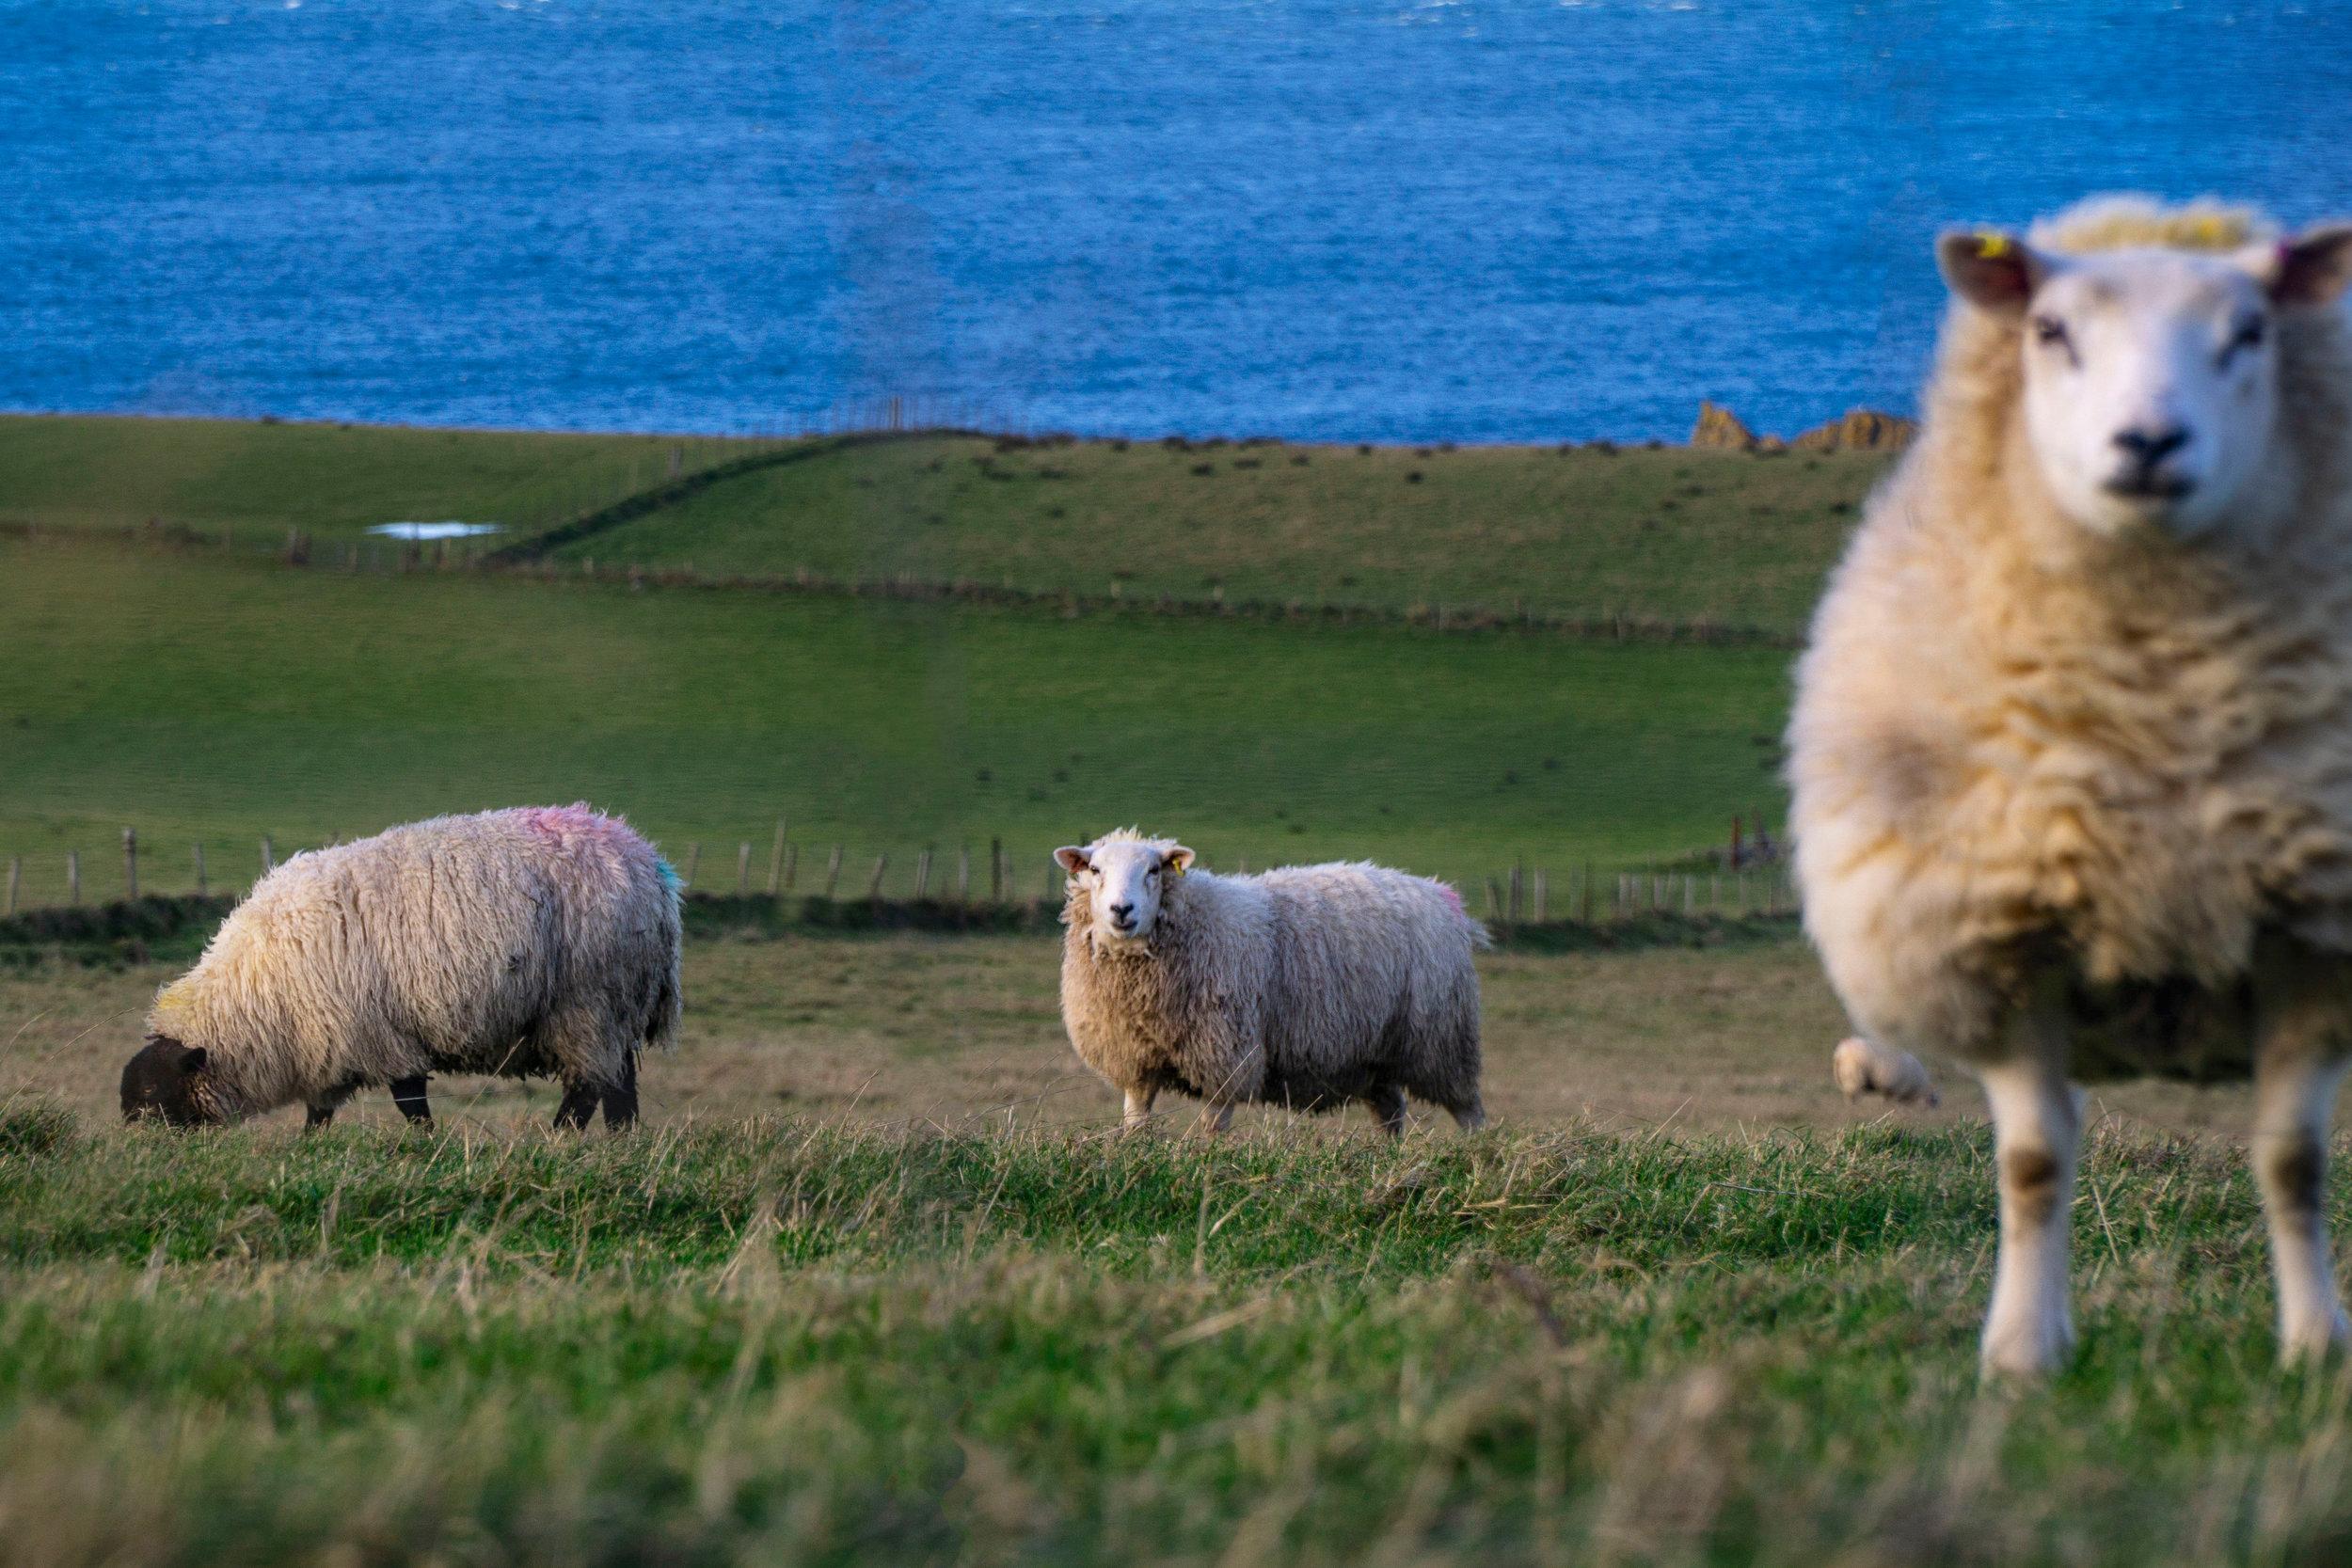 north_irealnd_sheep_vickygood_travel_phototgraphy_sm.jpg